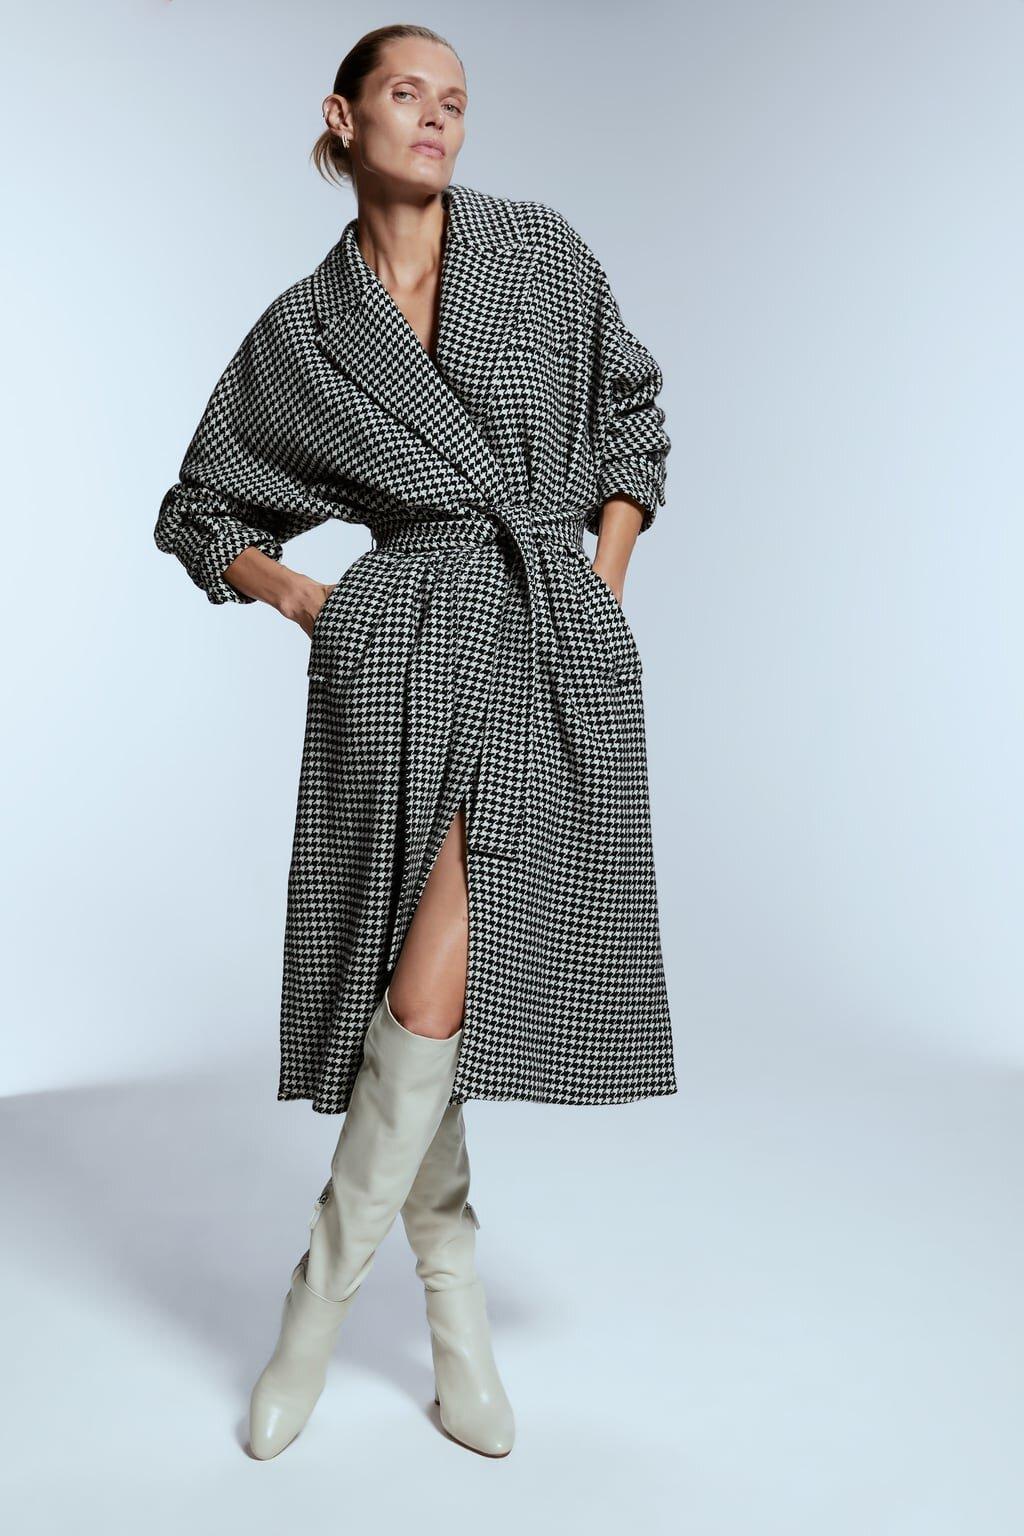 Zara Houndstooth Coast $199